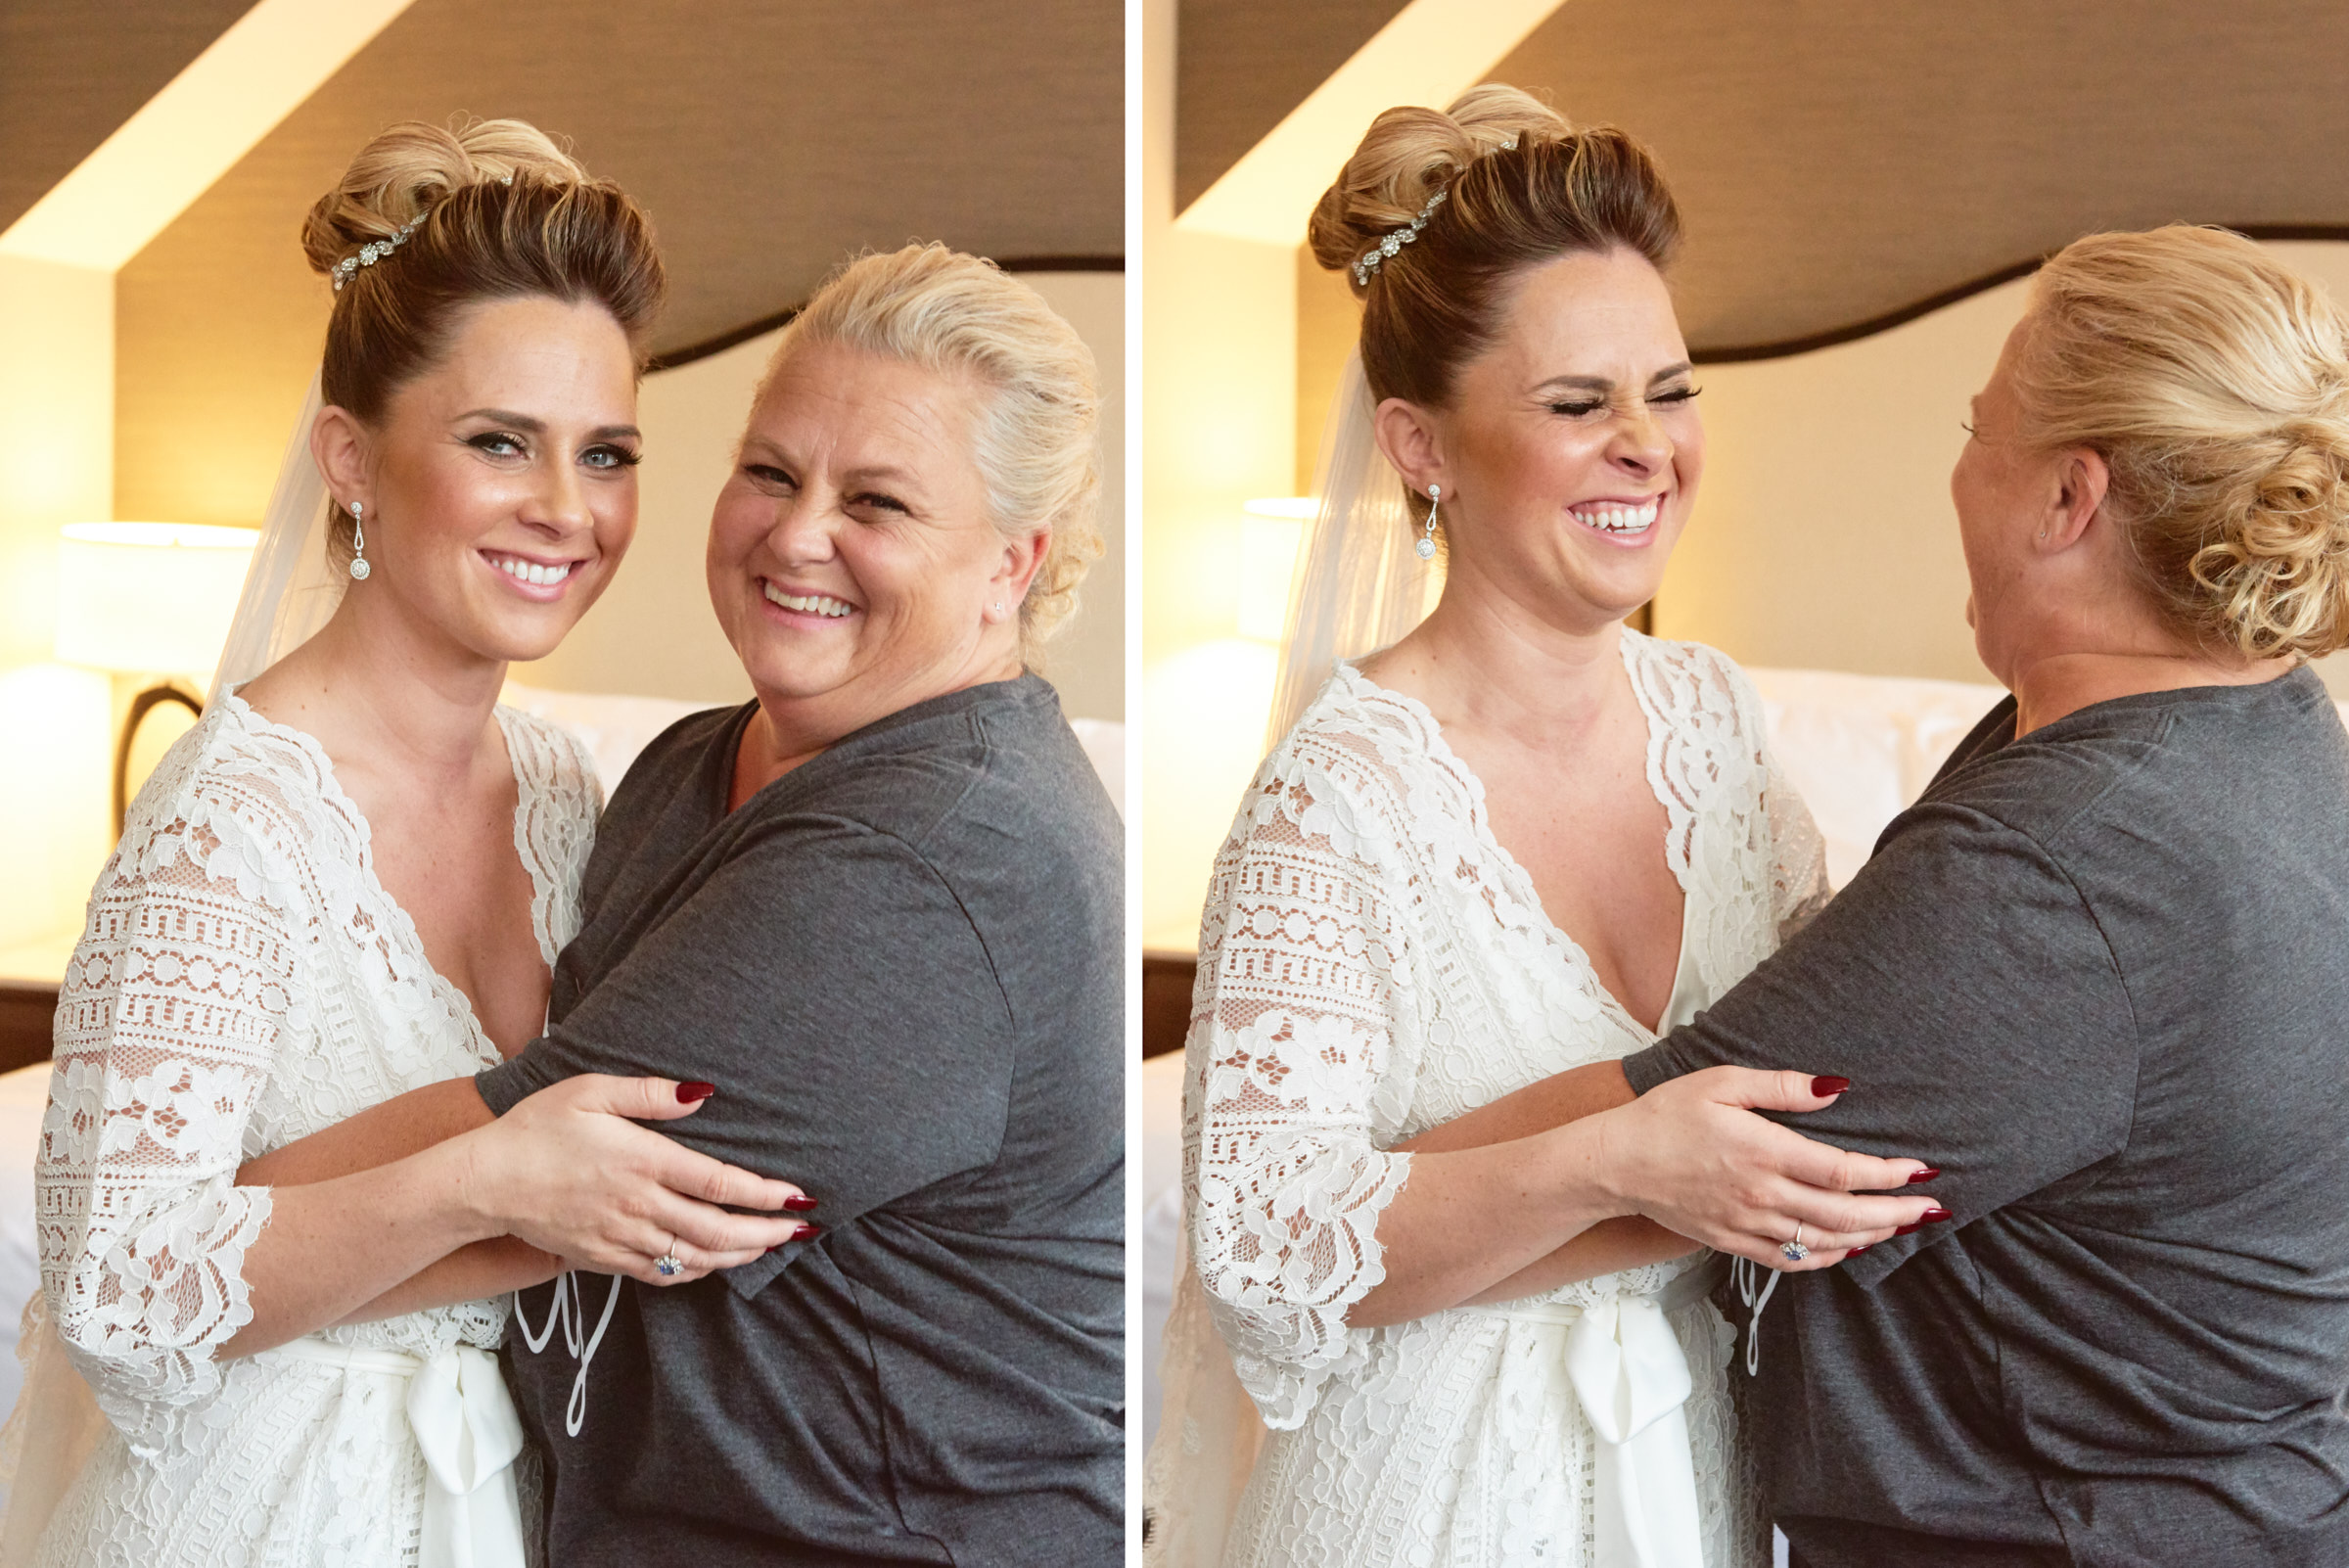 Bride and mom wedding portrait at Intercontinental Chicago